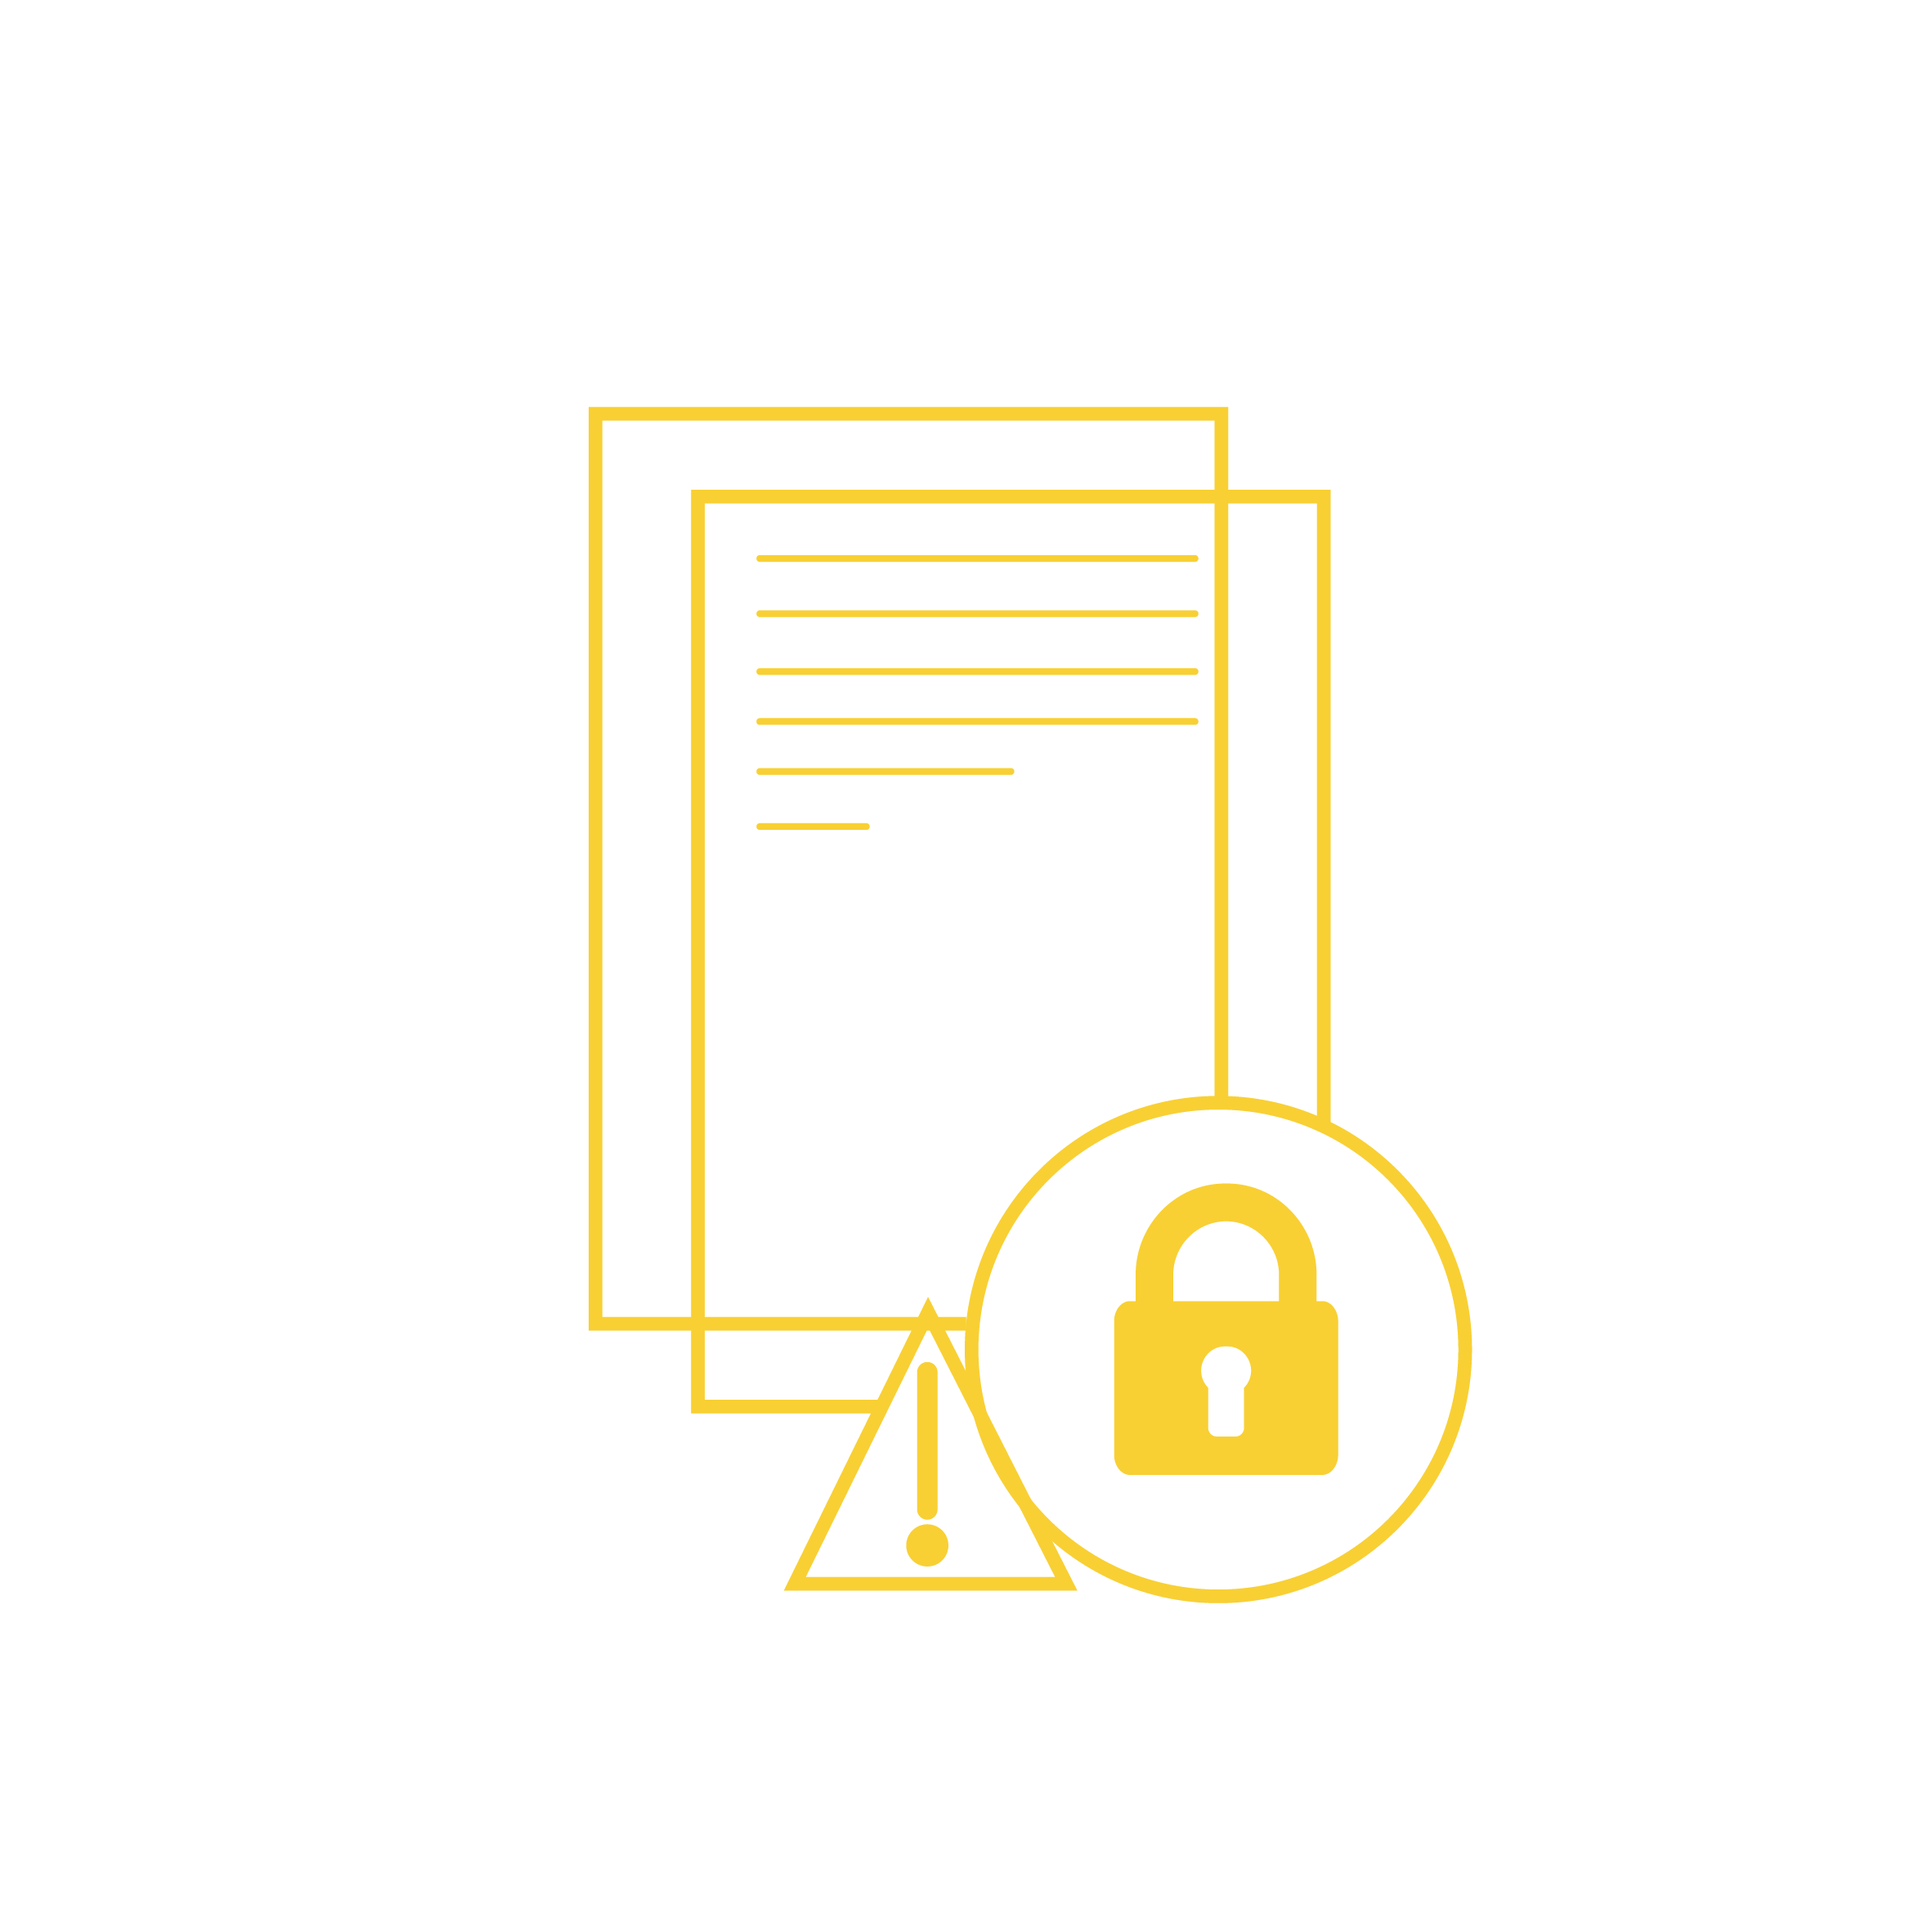 Data Risk Management as a Service (DRMaaS)